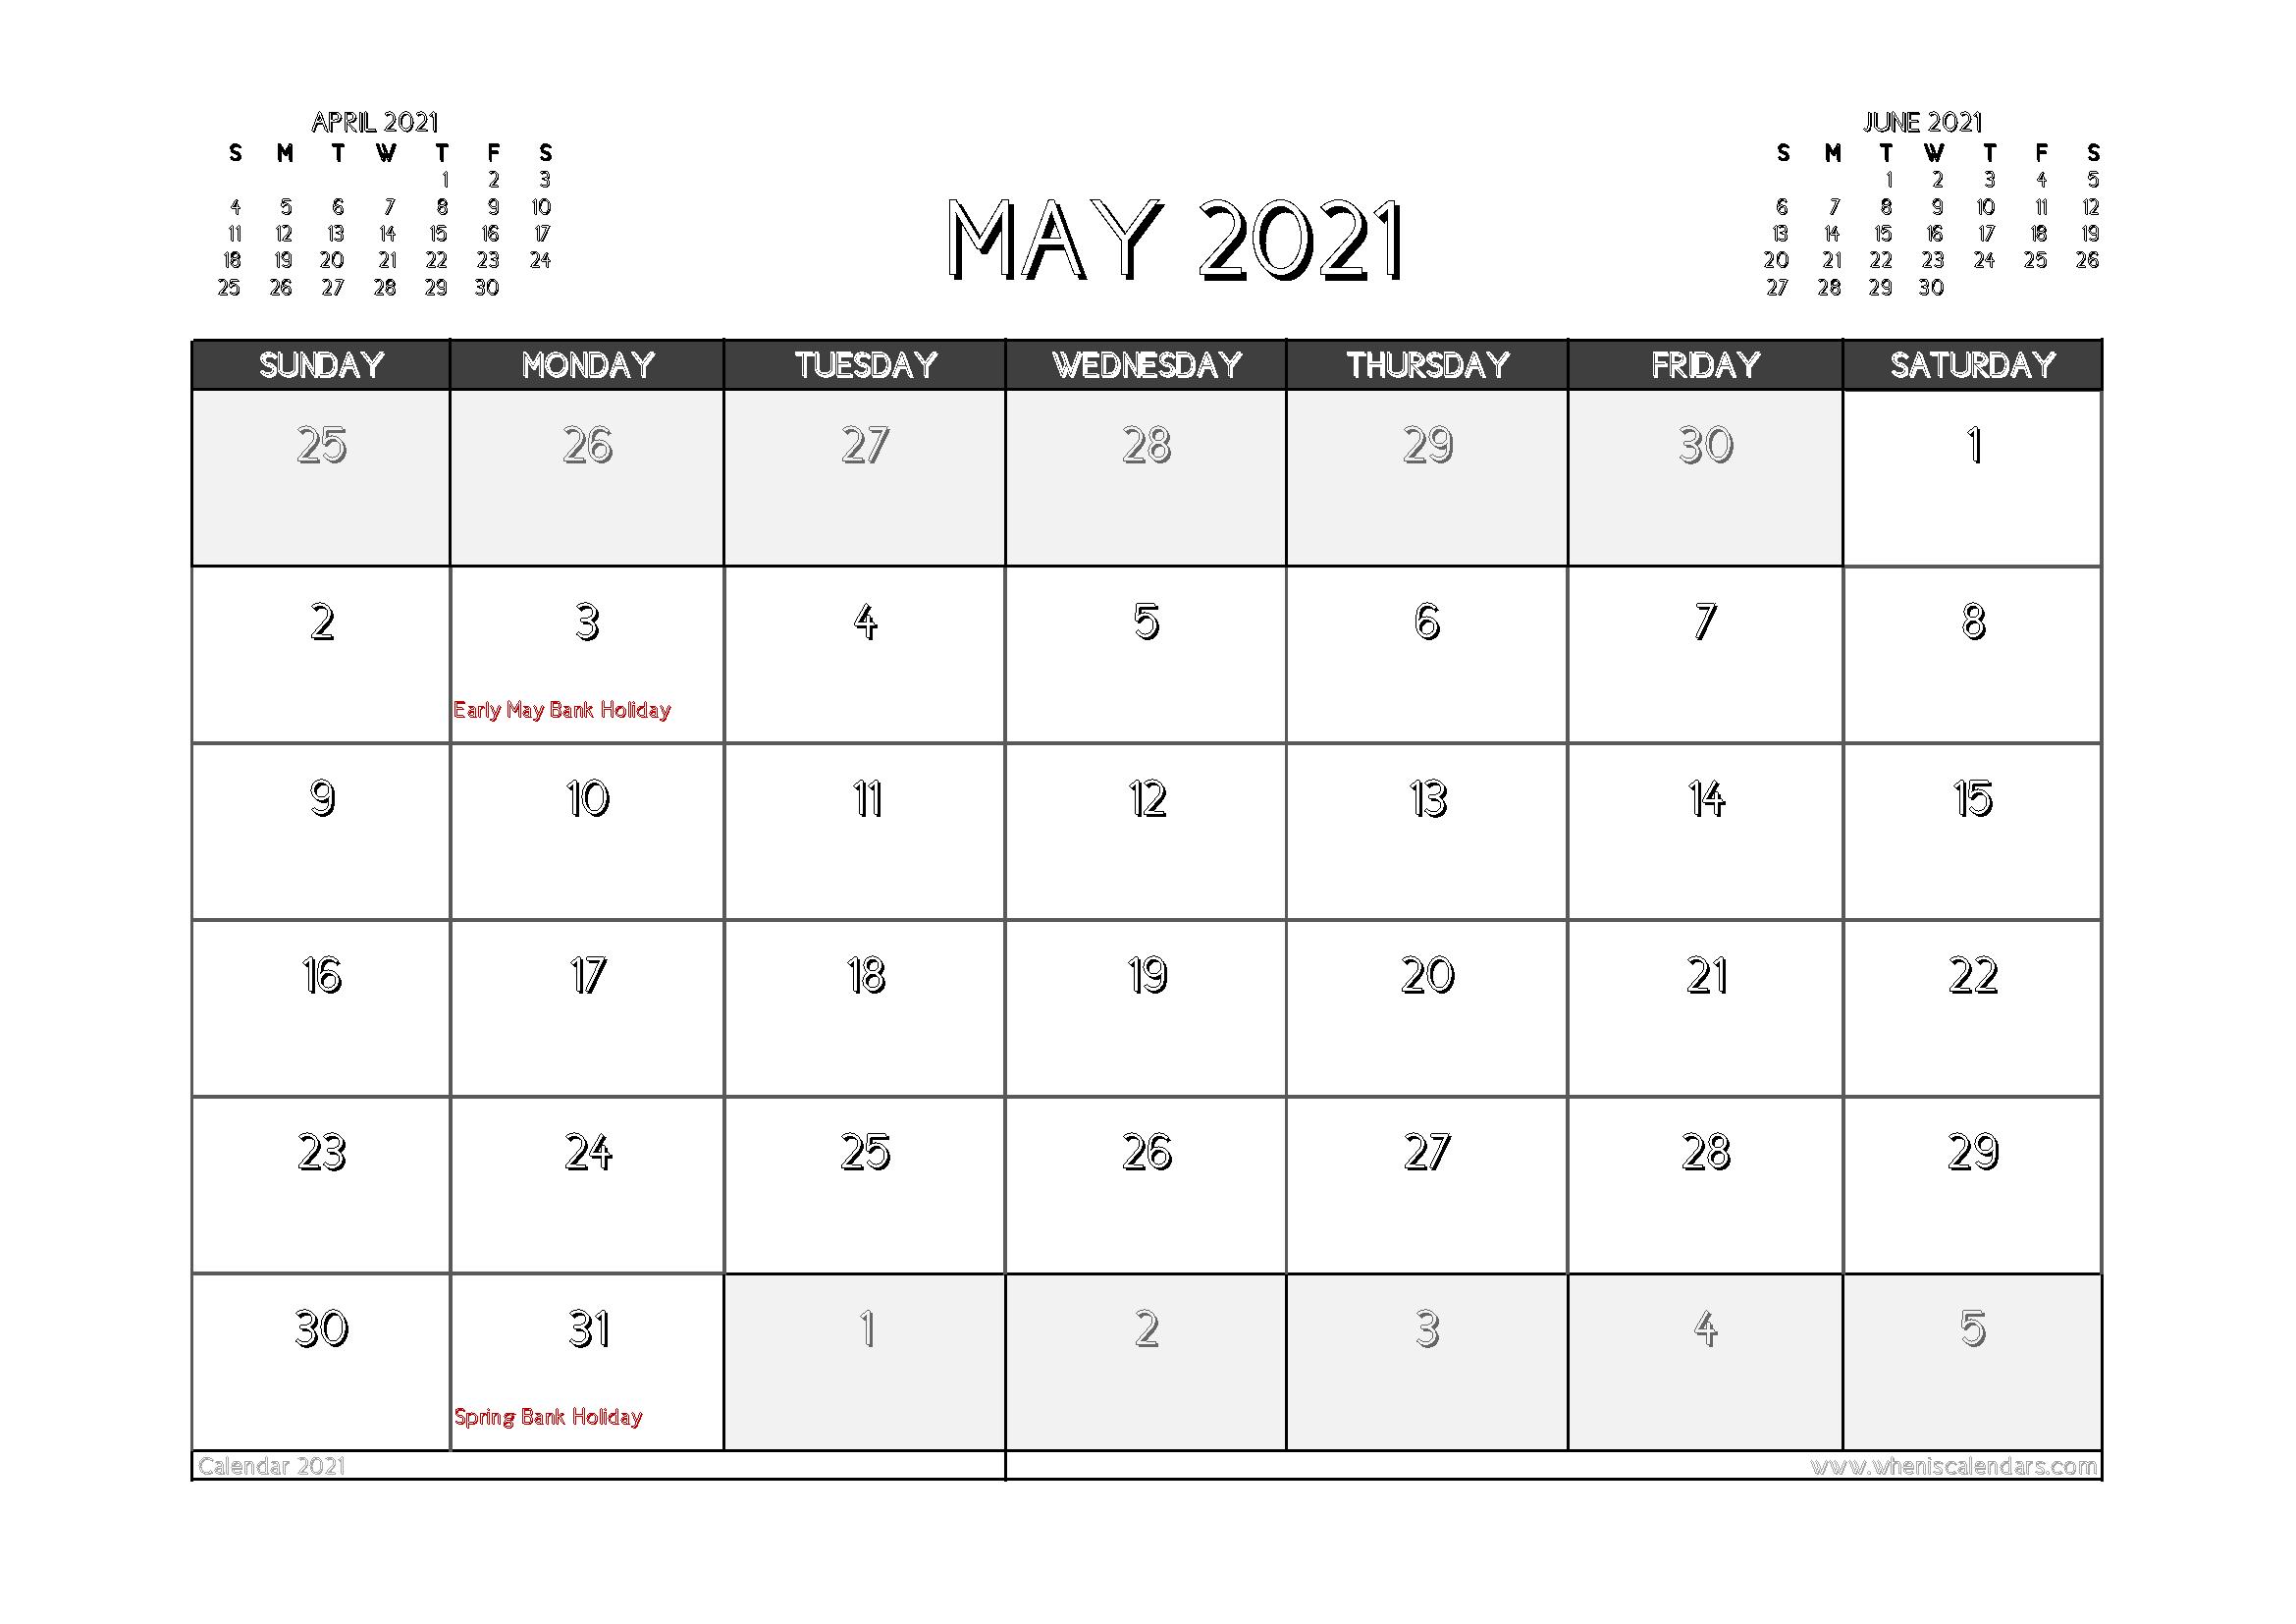 May 2021 Calendar Uk Printable In 2020 Calendar Uk 2021 Calendar Printable Calendar Template